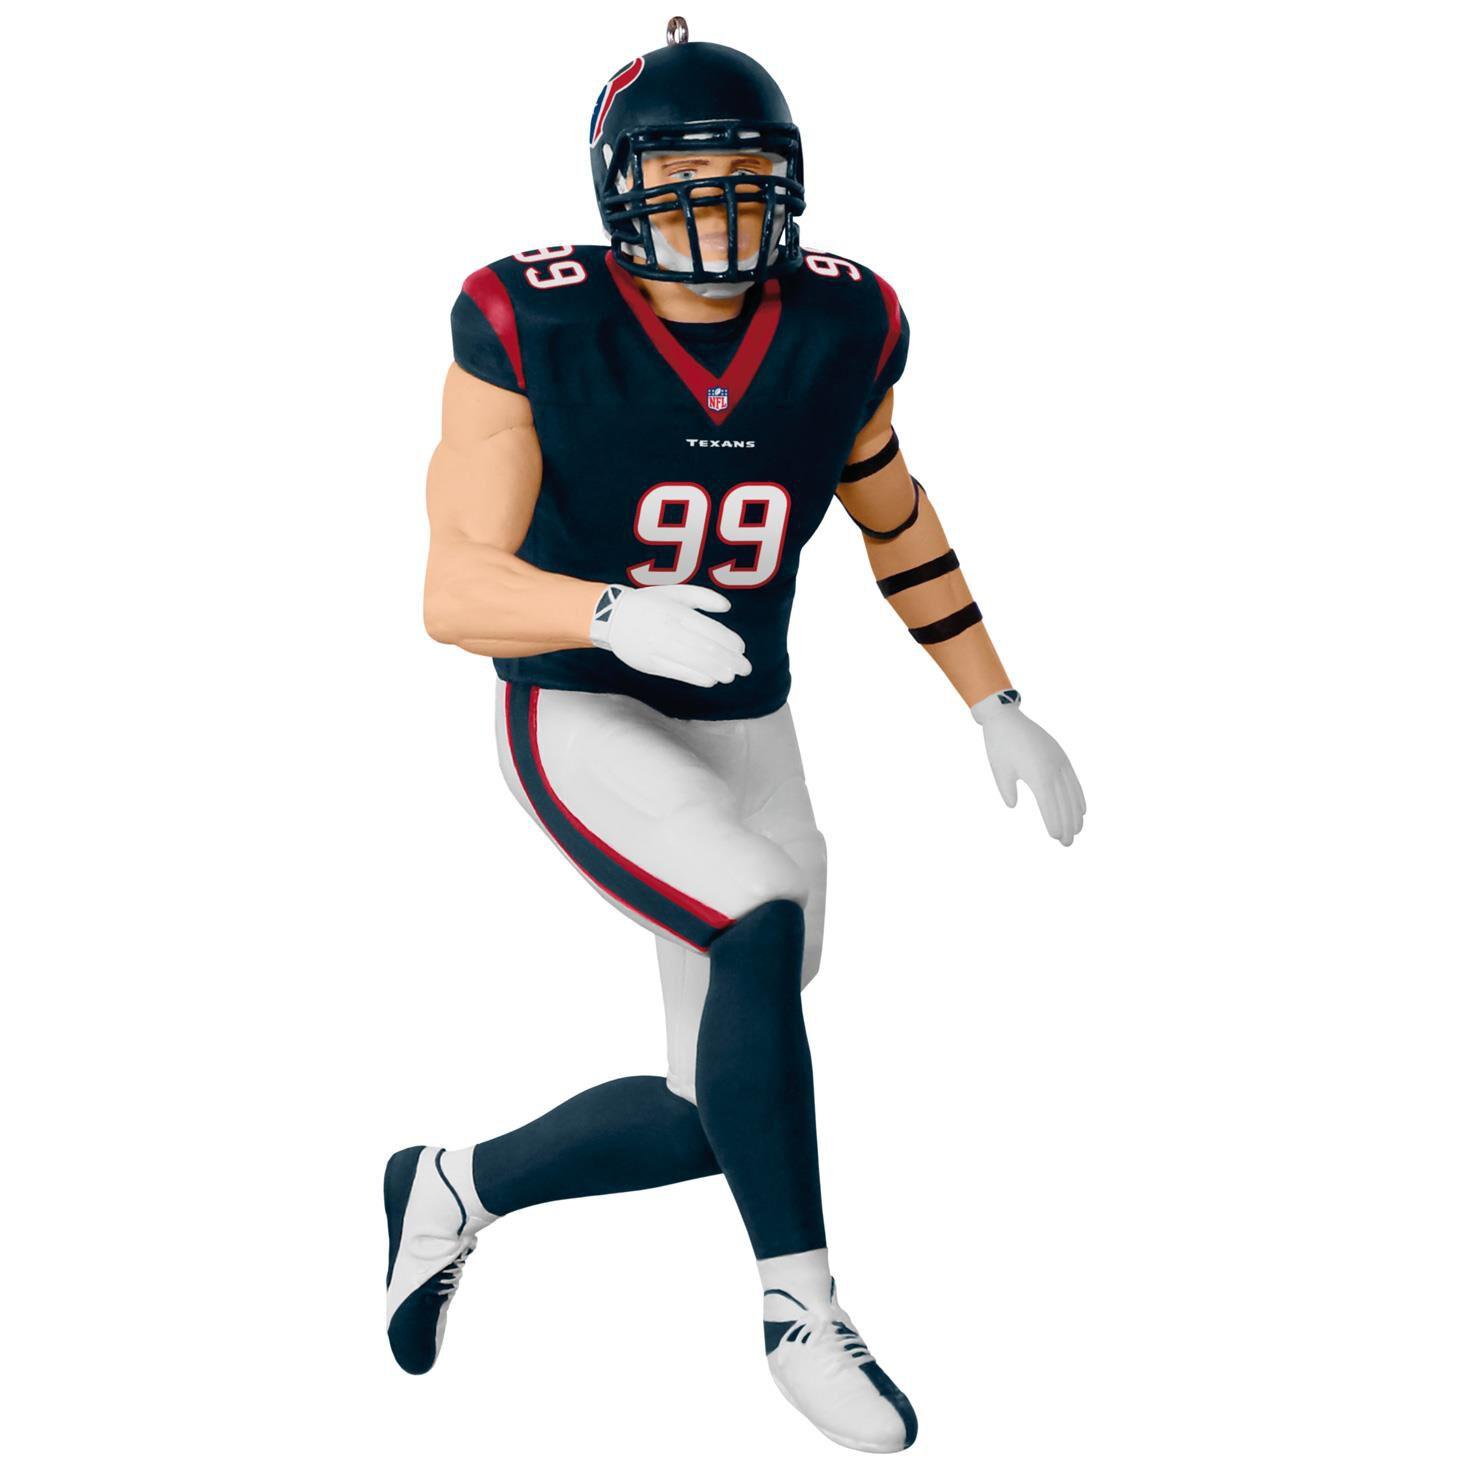 NFL Houston Texans J. J. Watt Ornament - Keepsake Ornaments - Hallmark